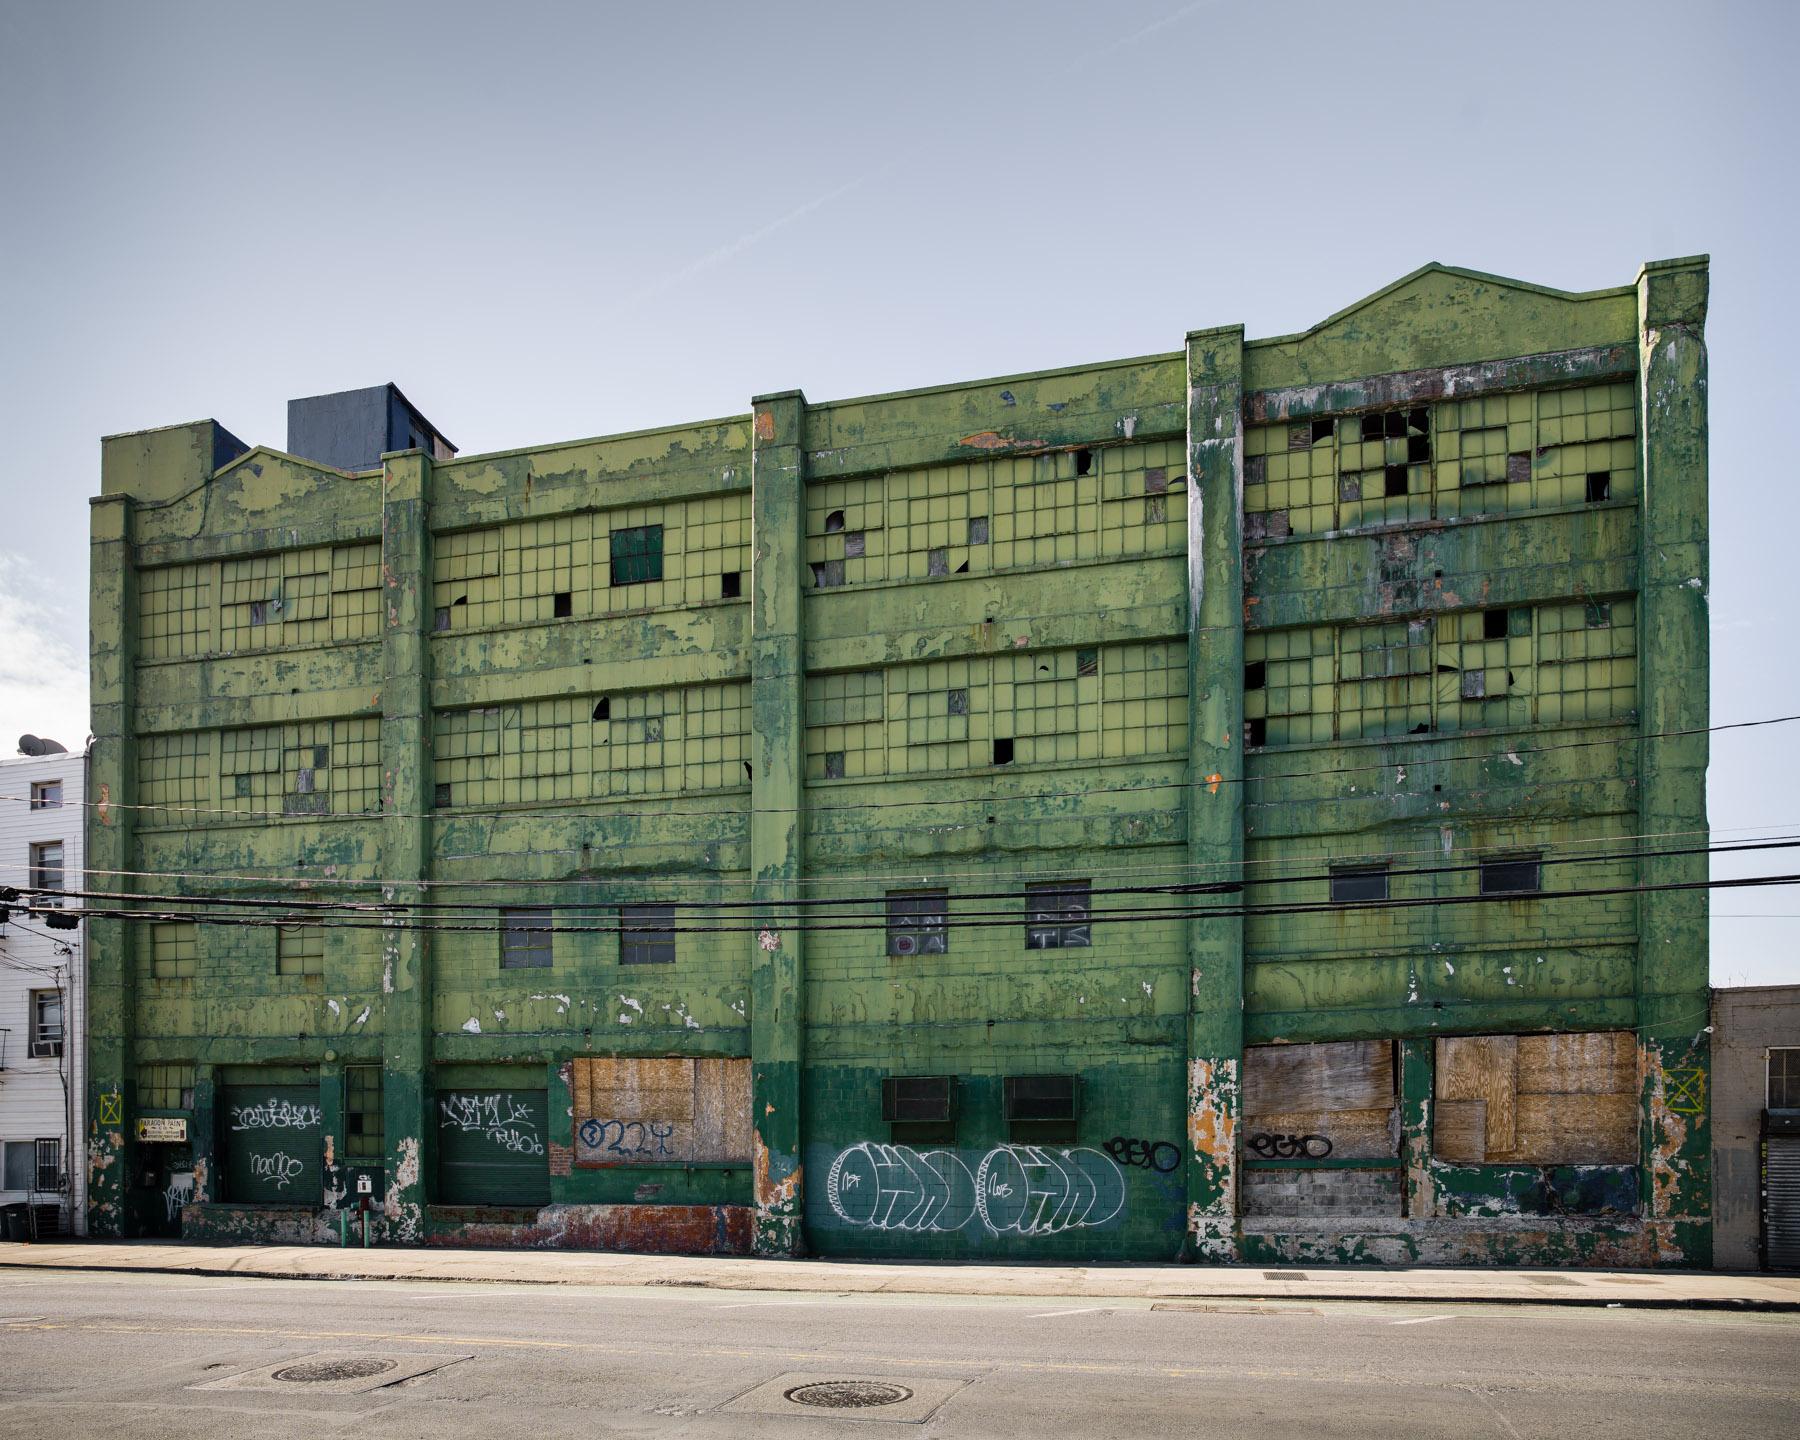 Vernon Blvd, Long Island City, New York, 2014